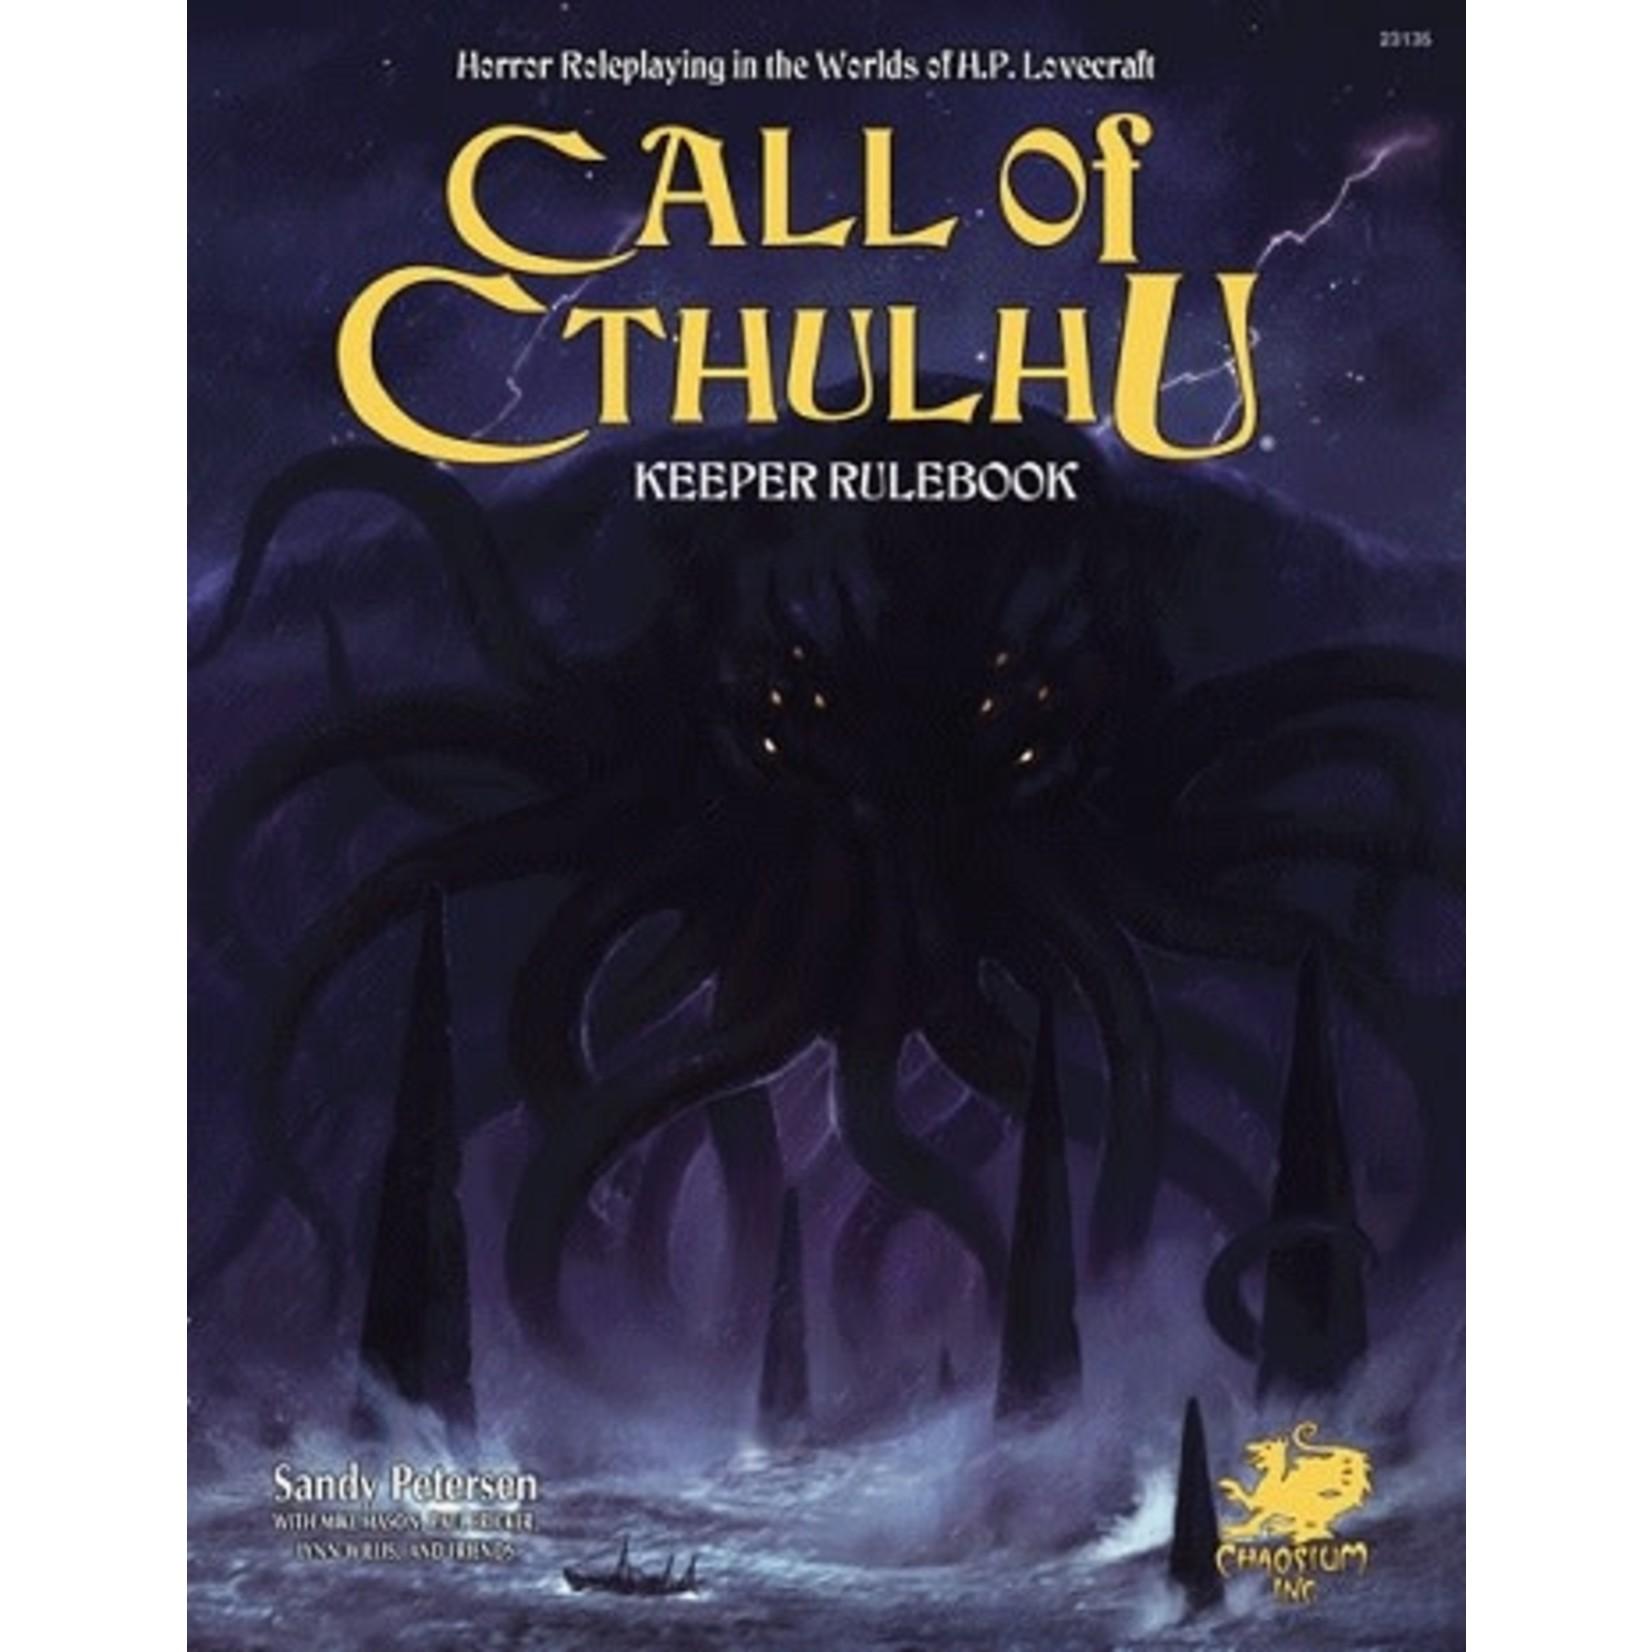 Chaosium Call of Cthulhu 7th Keeper Rulobook (Anglais)